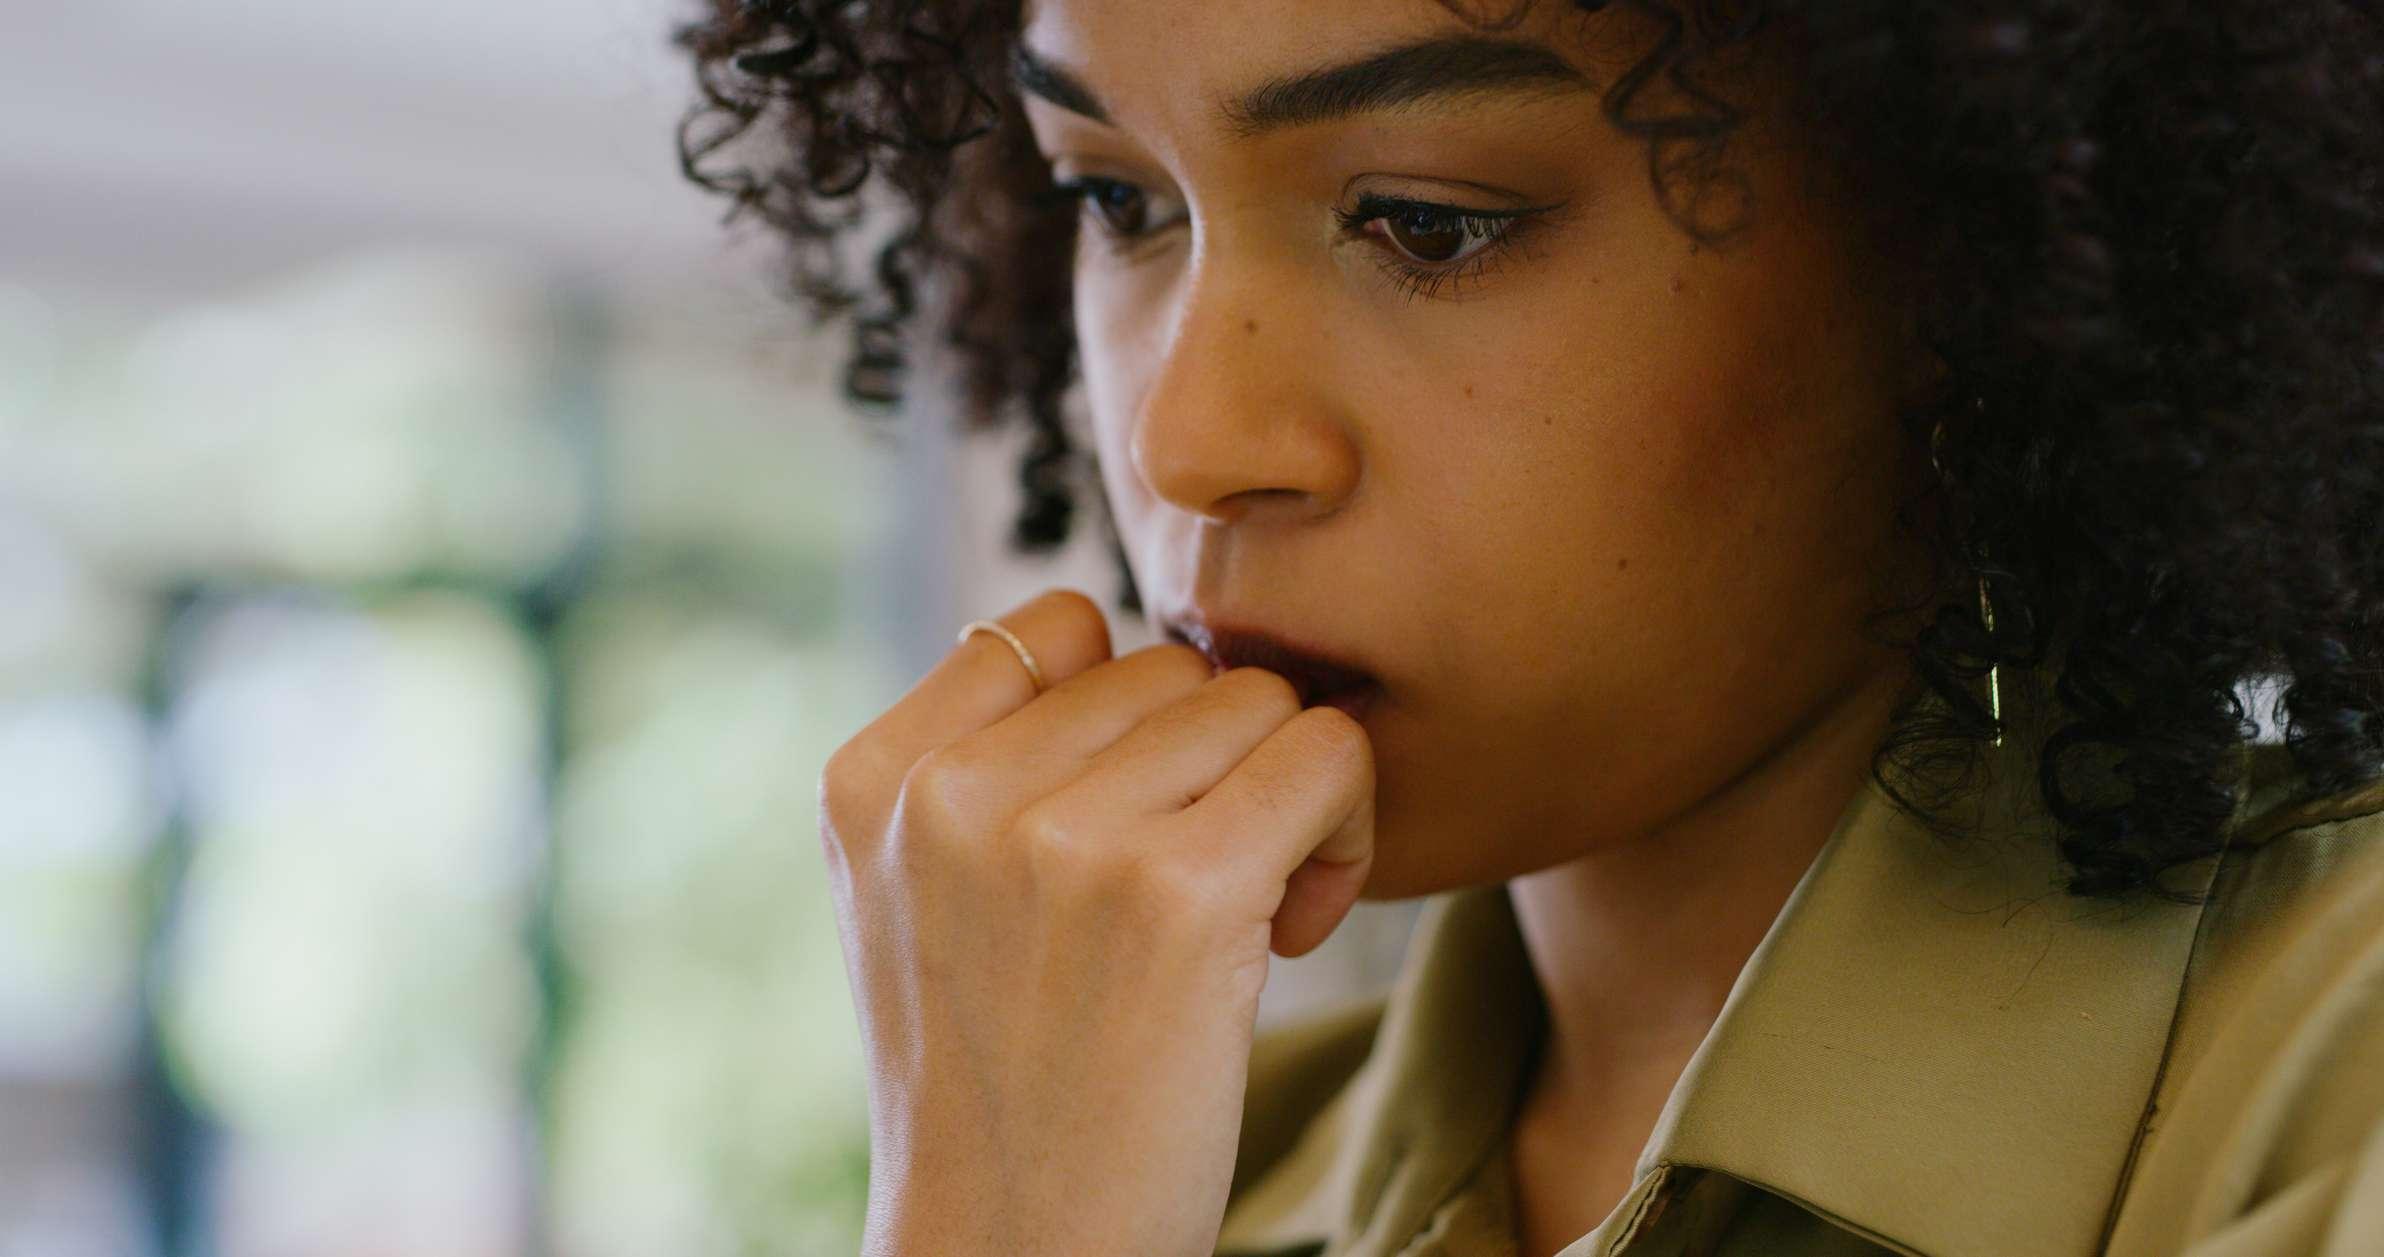 Anxious person may be experiencing agoraphobia